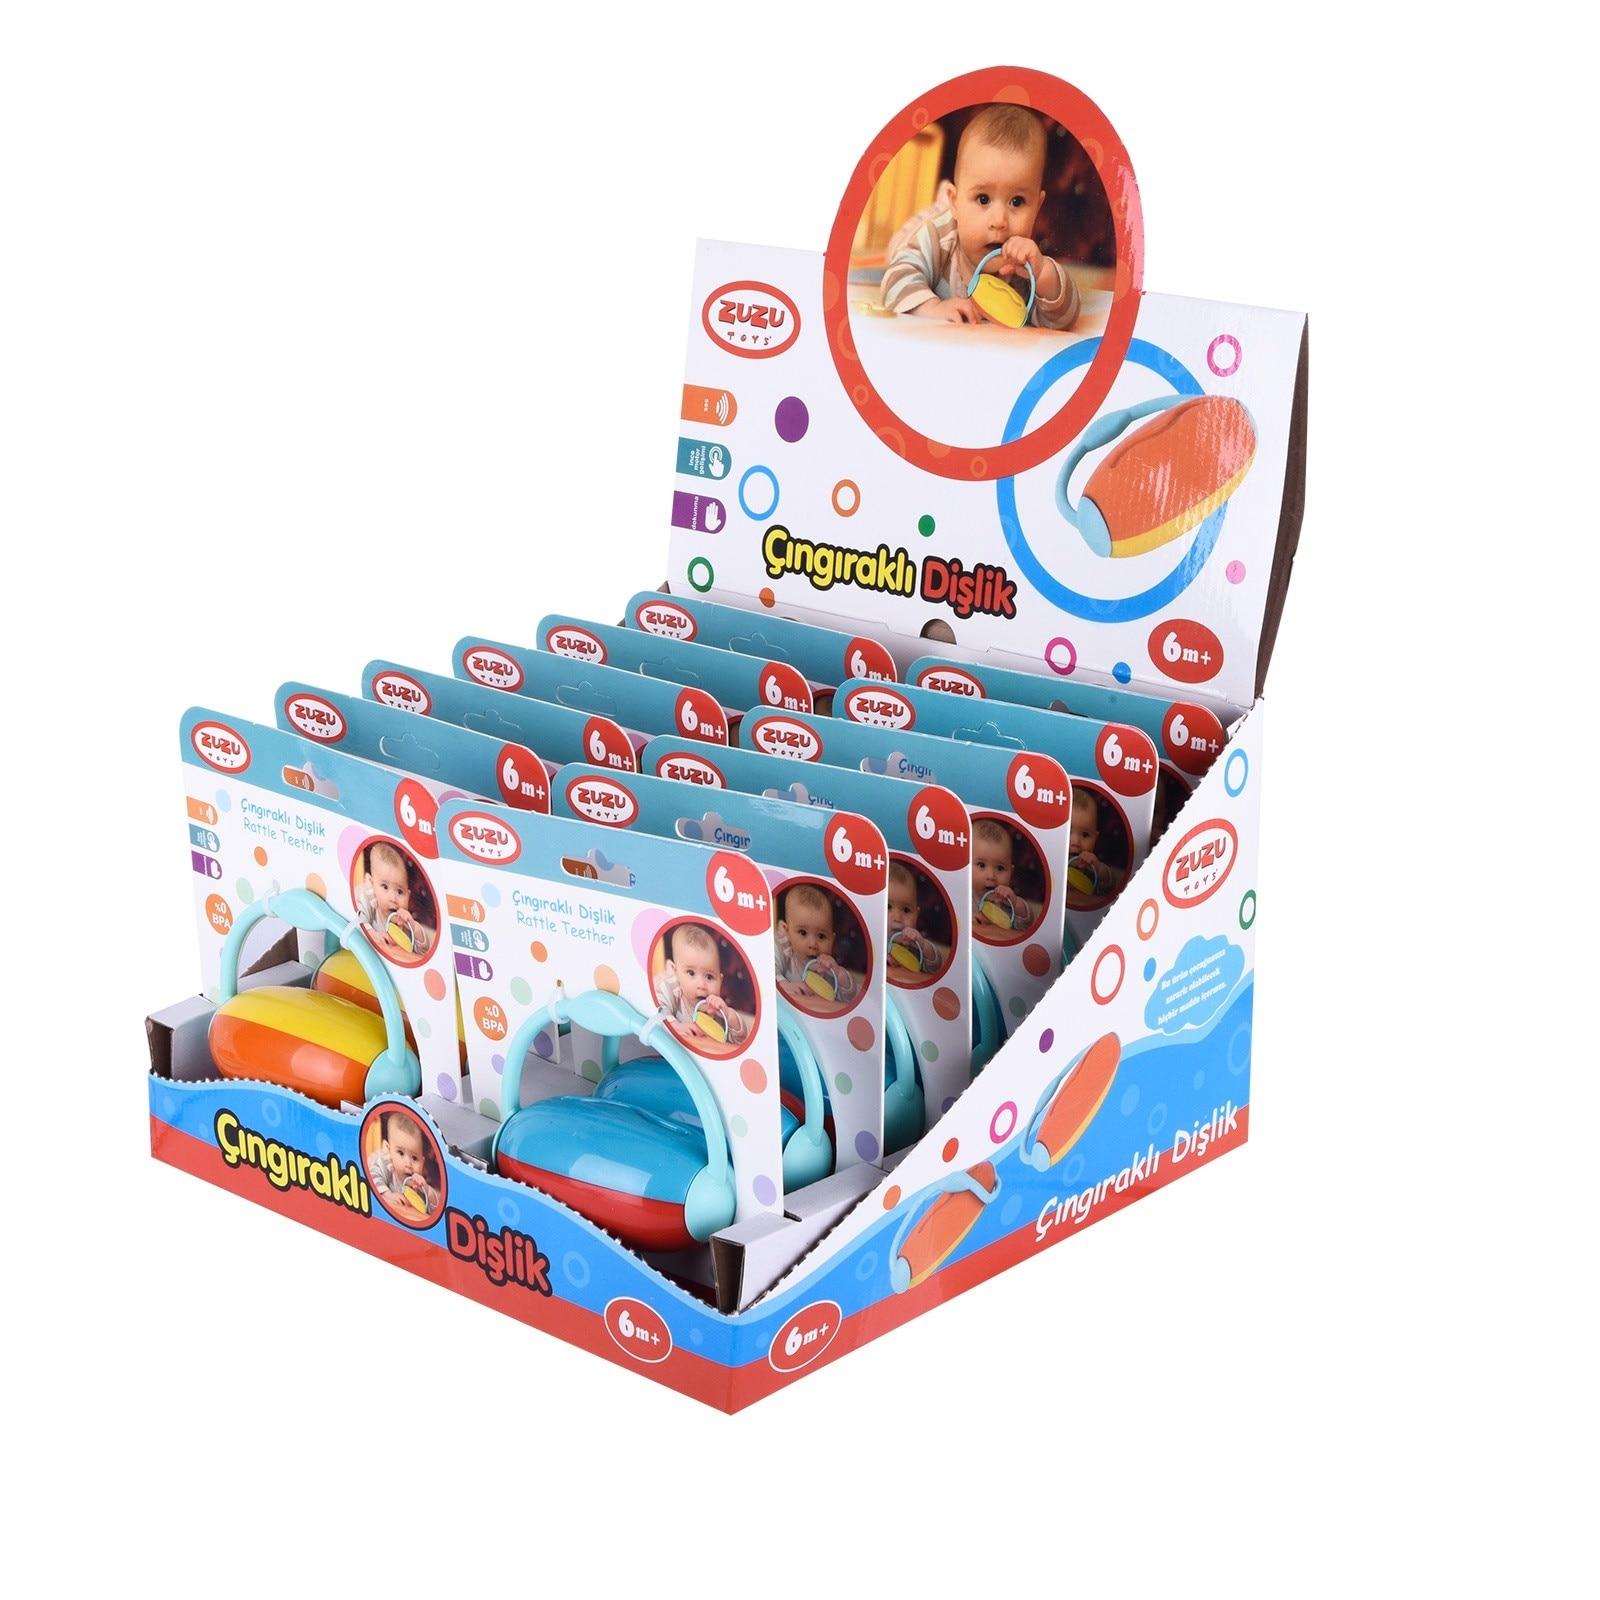 Ebebek Zuzu Toys Rattle Baby Teether